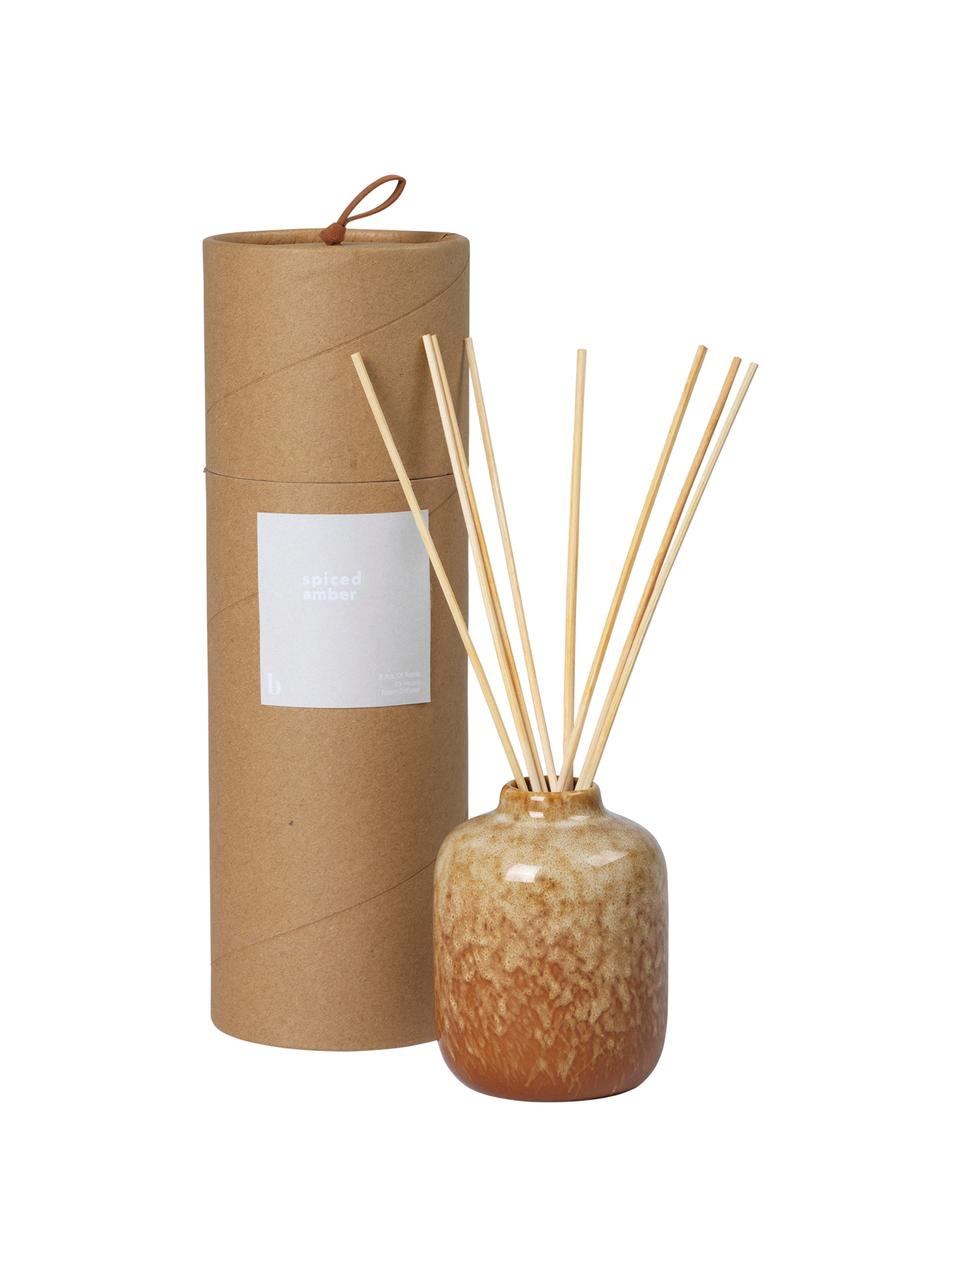 Diffuser Spiced Amber (Ambra), Behälter: Keramik, Brauntöne, Ø 7 x H 9 cm